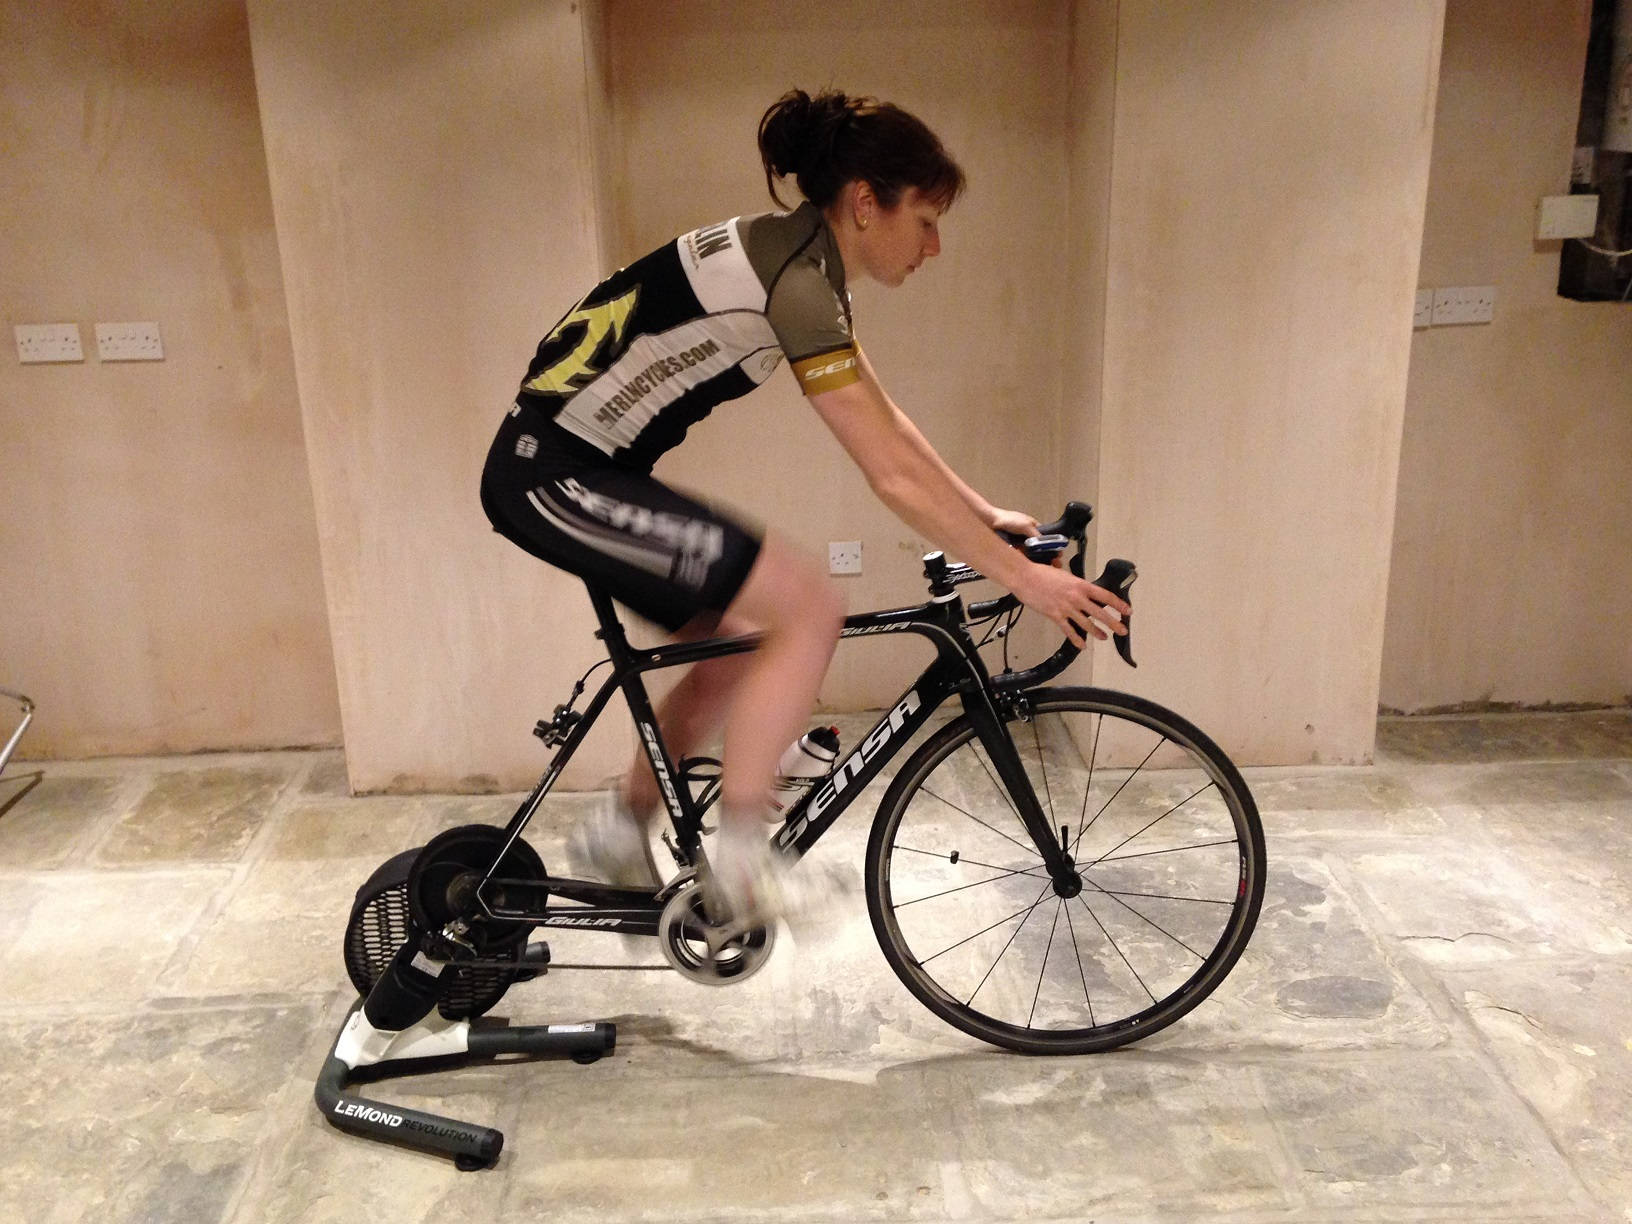 lemond revolution trainer rider